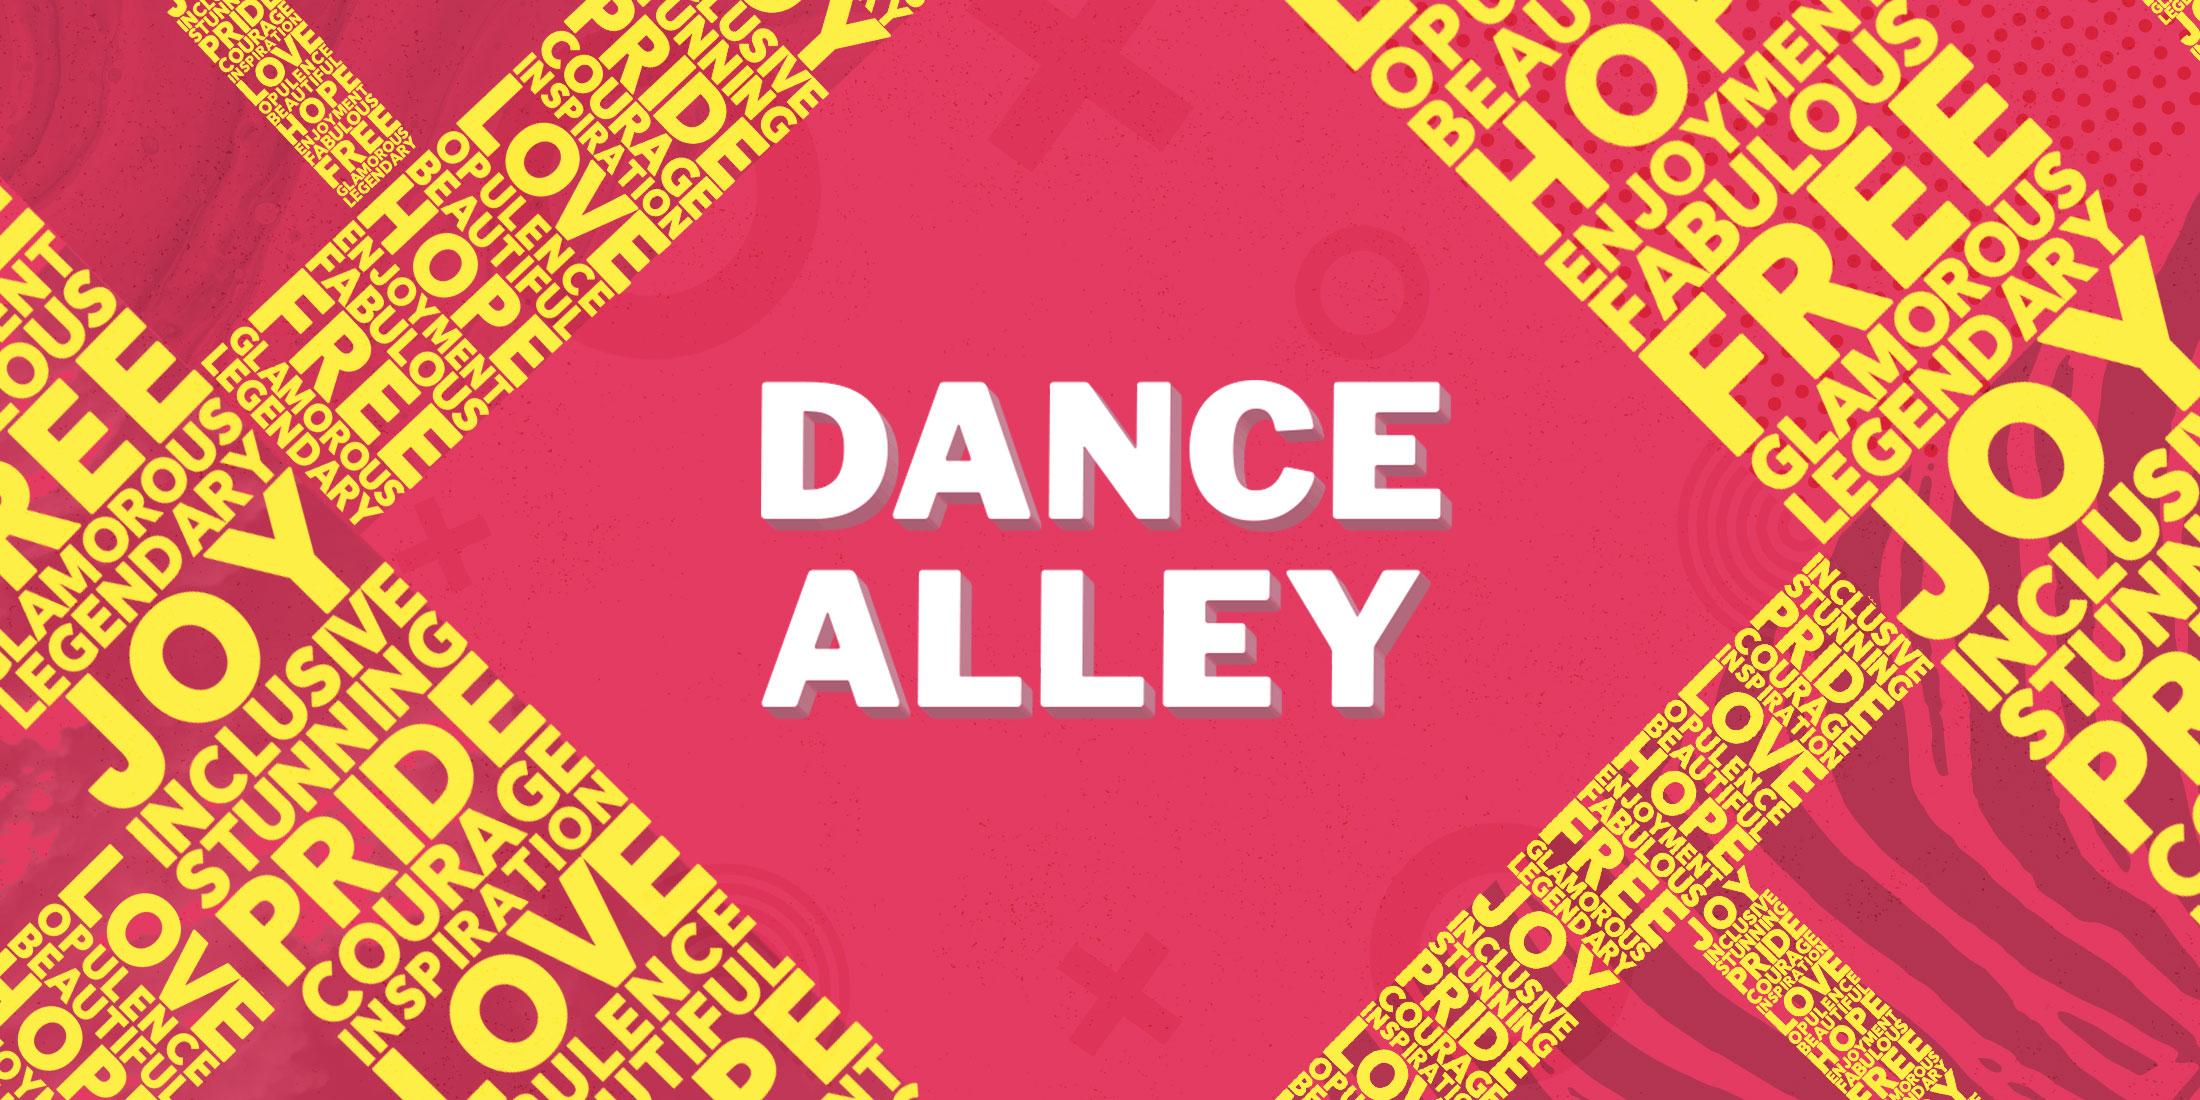 Dance Alley